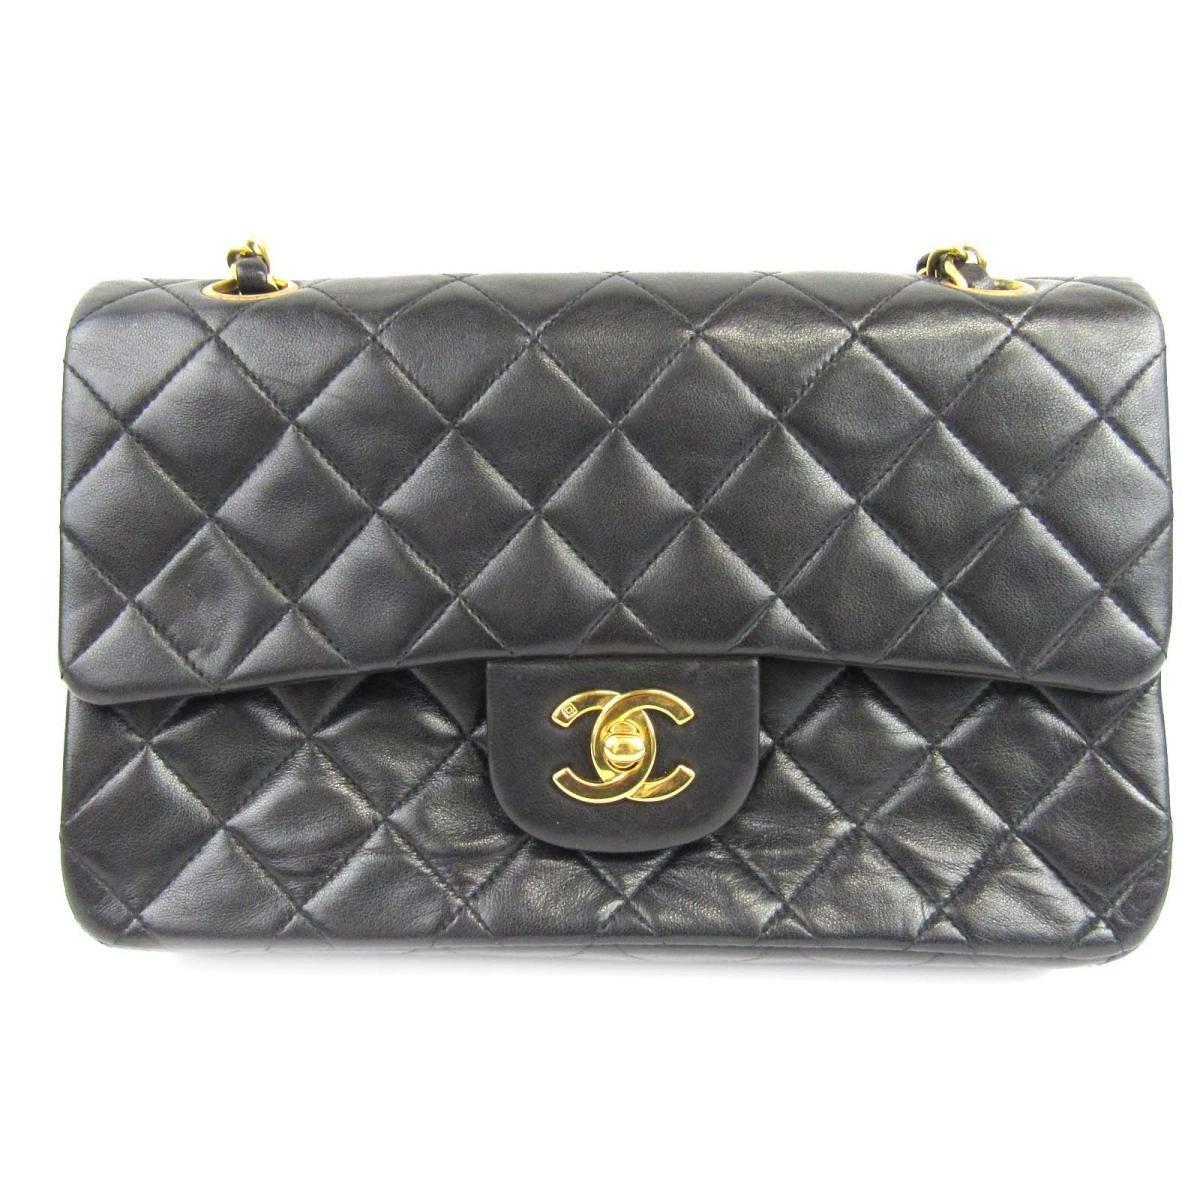 367ef1e6ddb6 Chanel Matelasse W Flap Chain Shoulder Bag Lambskin Leather Black ...